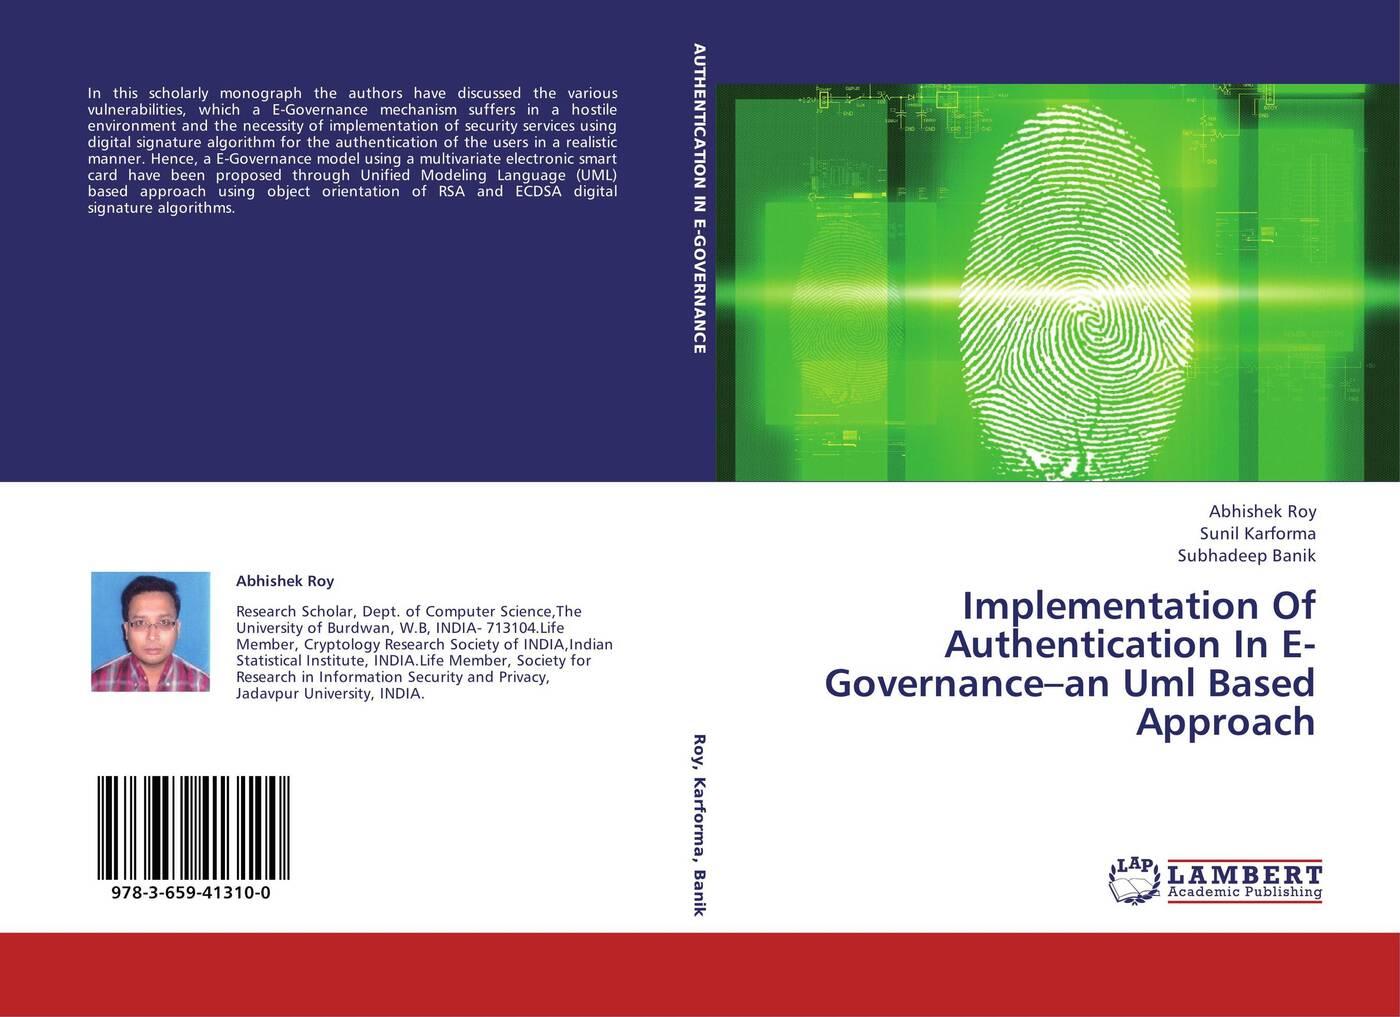 Abhishek Roy,Sunil Karforma and Subhadeep Banik Implementation Of Authentication In E-Governance-an Uml Based Approach